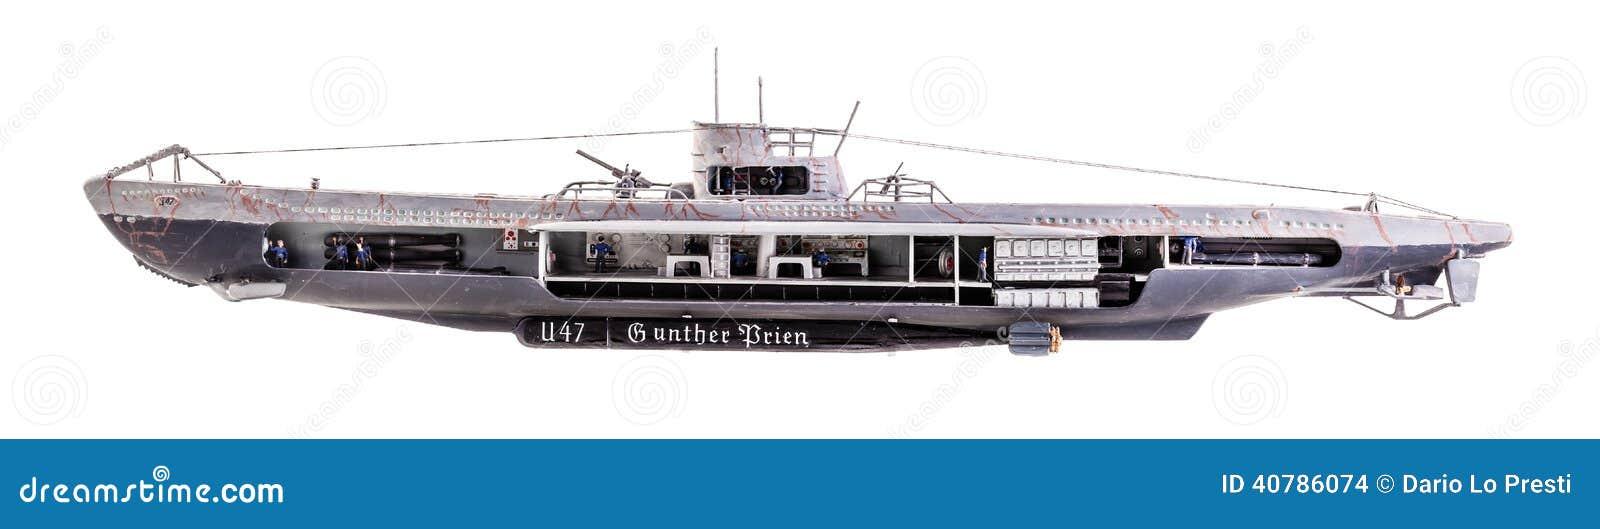 The German submarine U-47 was a Type VIIB U-boat of Nazi Germany's ...